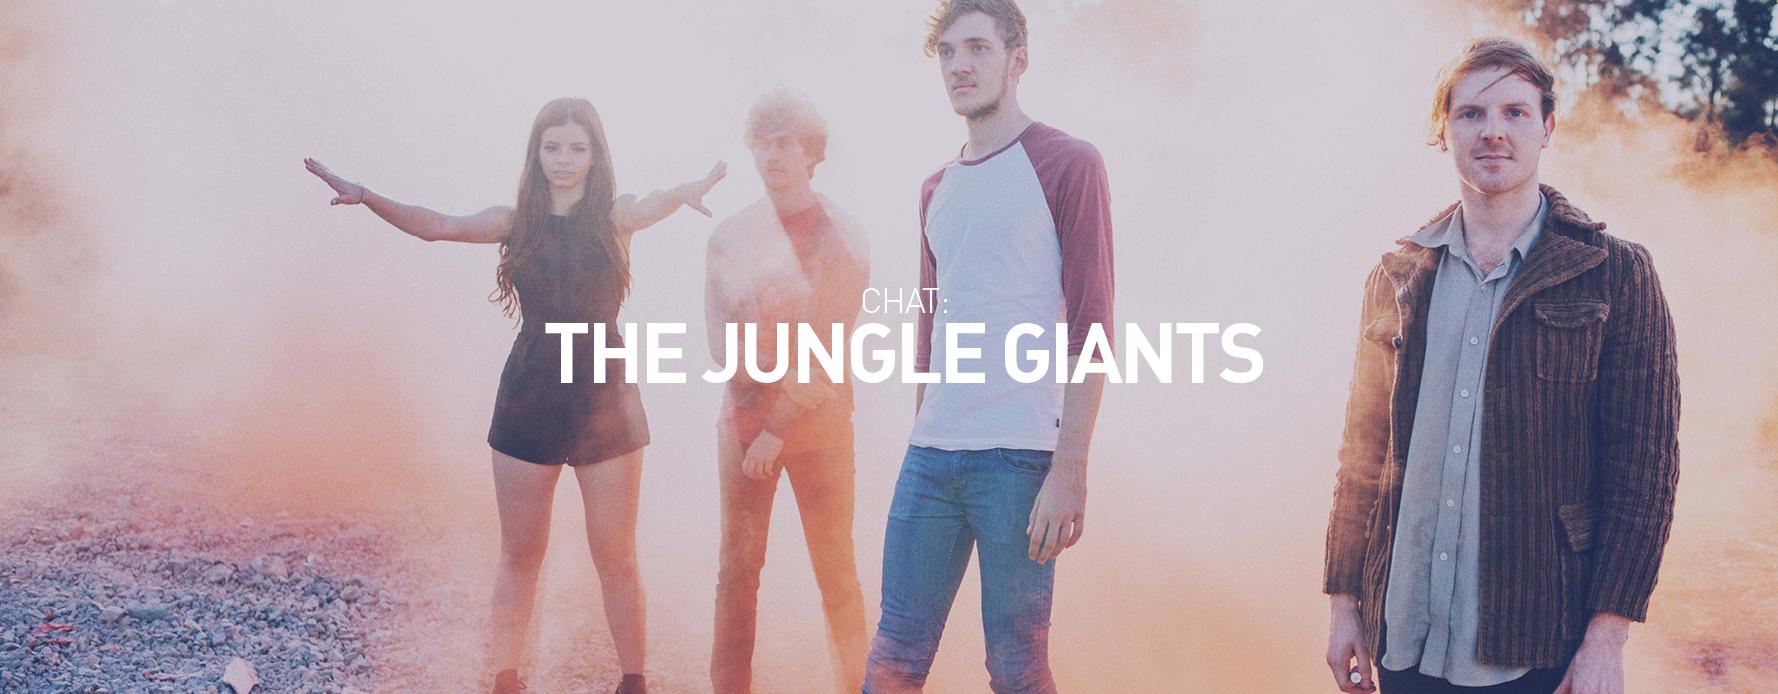 source: The Jungle Giants